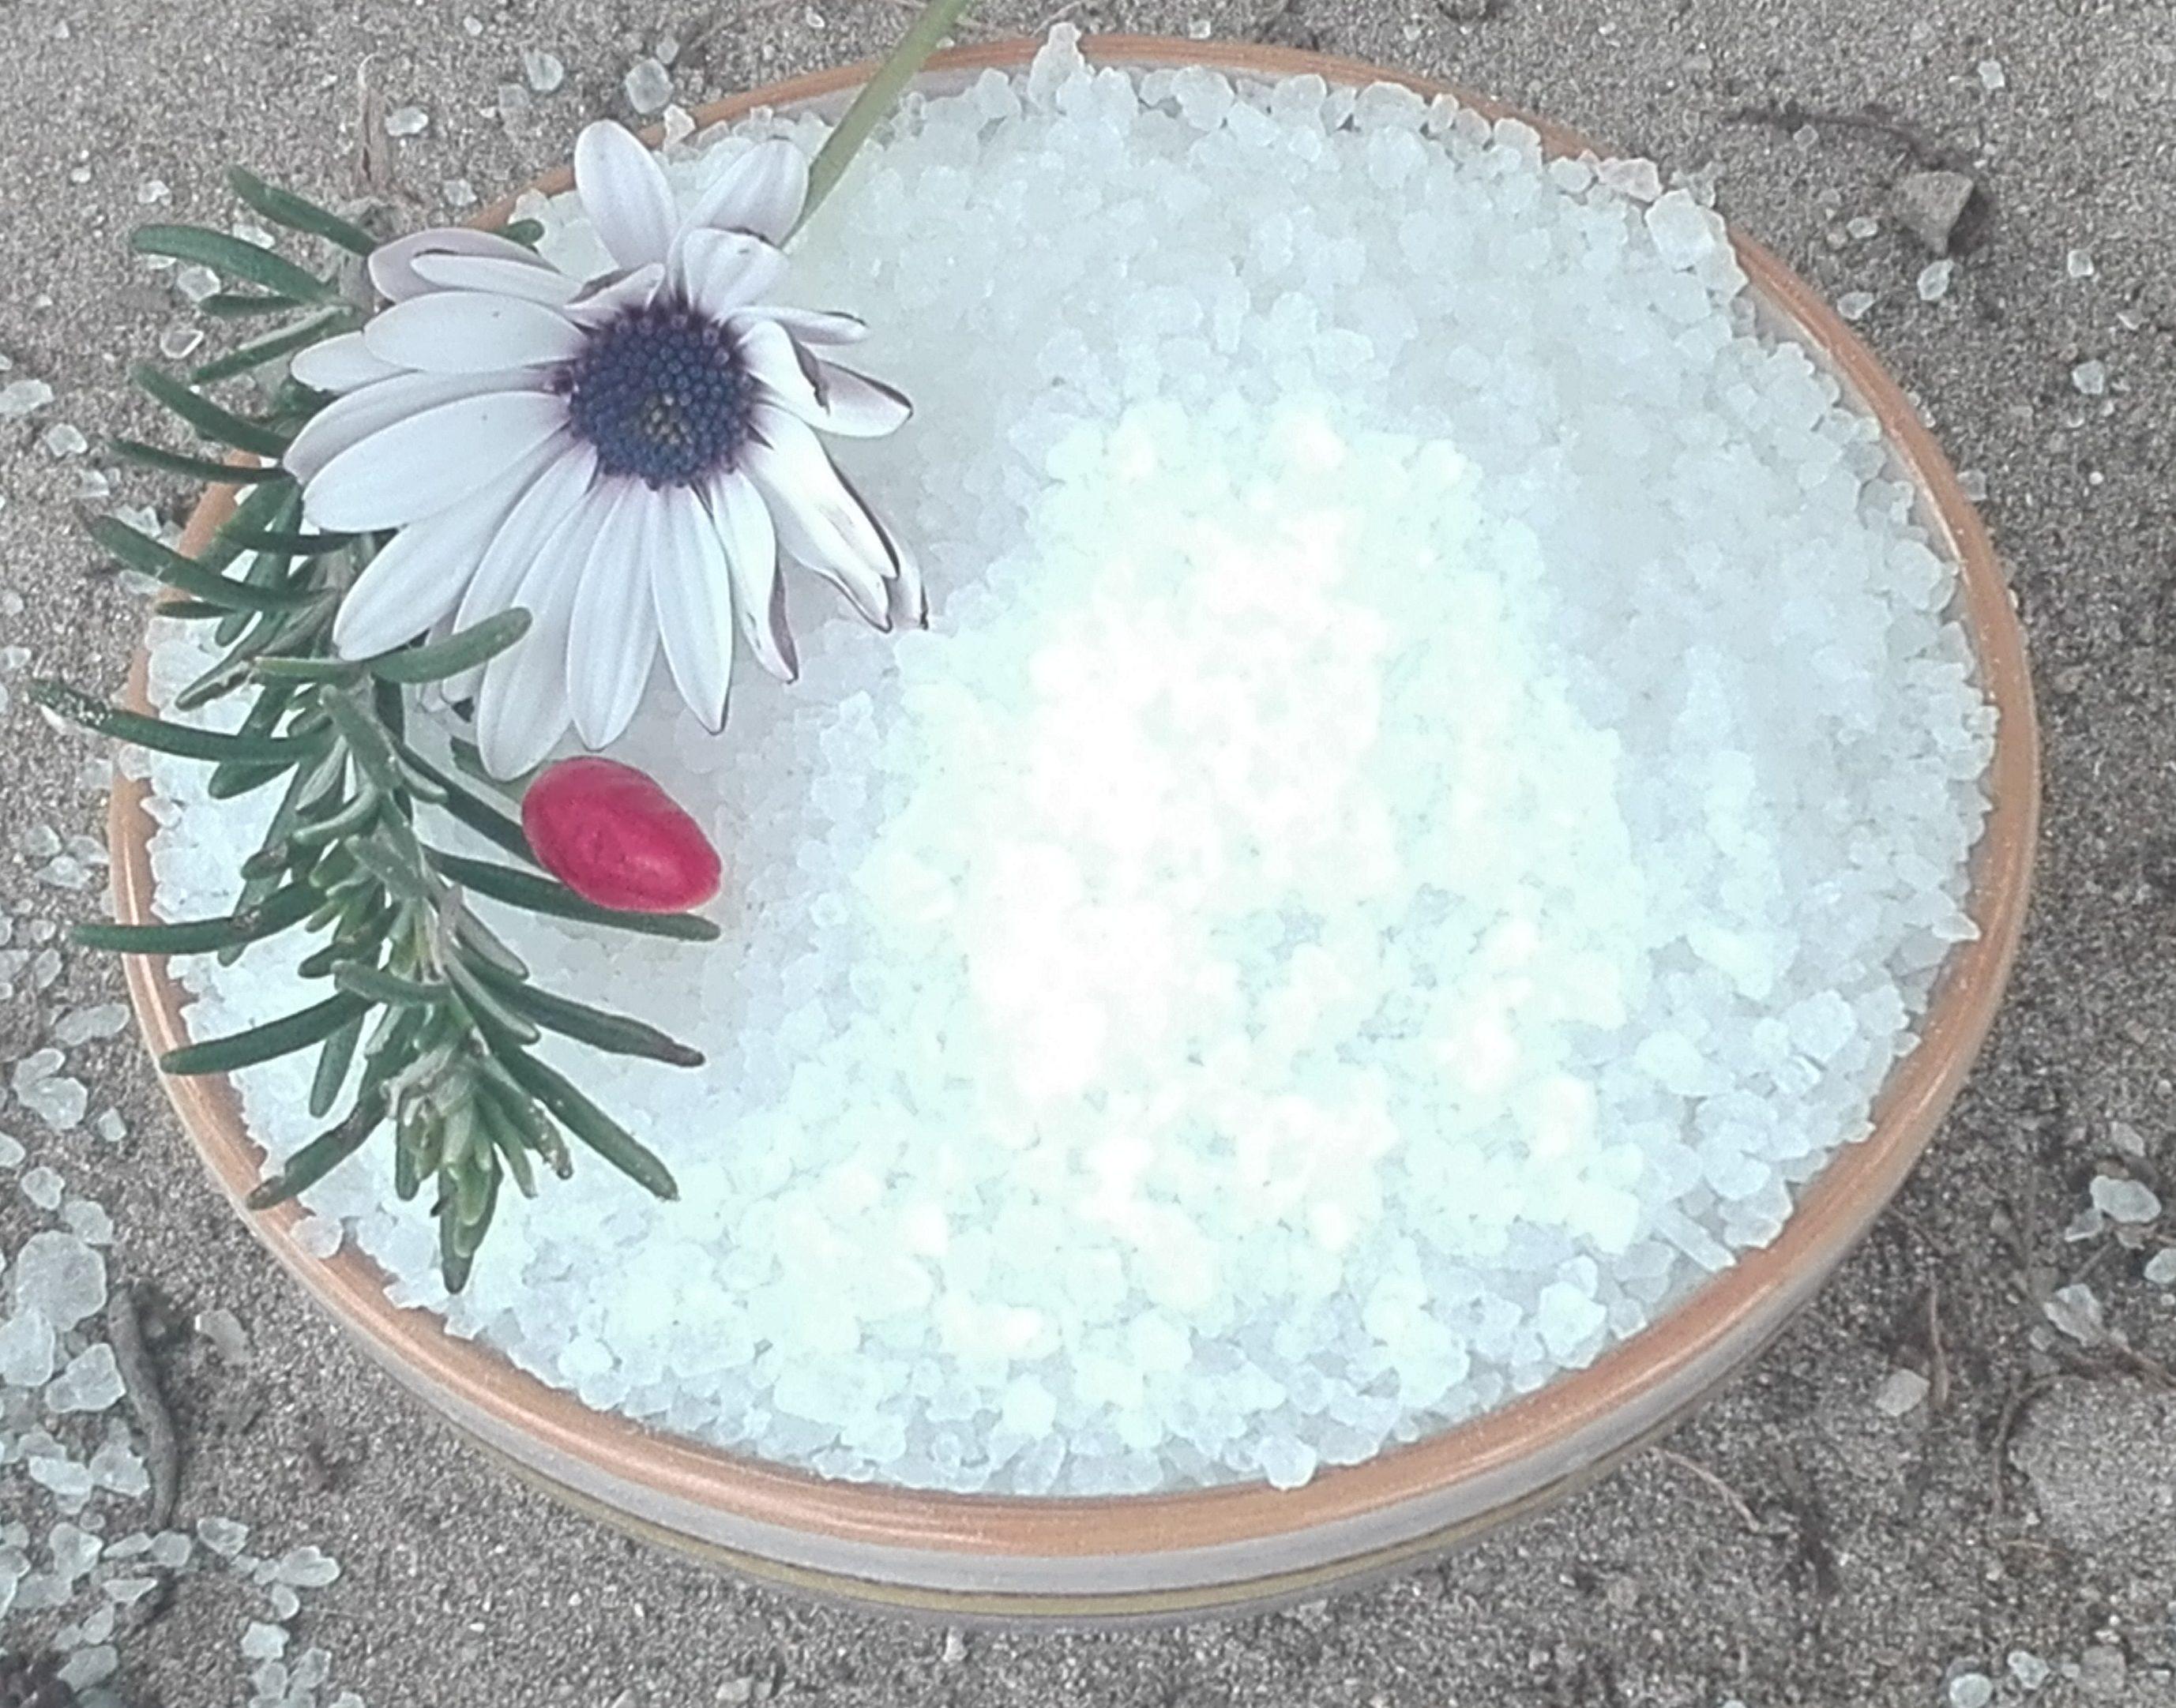 Gesundes Salz aus dem Meer - Meersalz